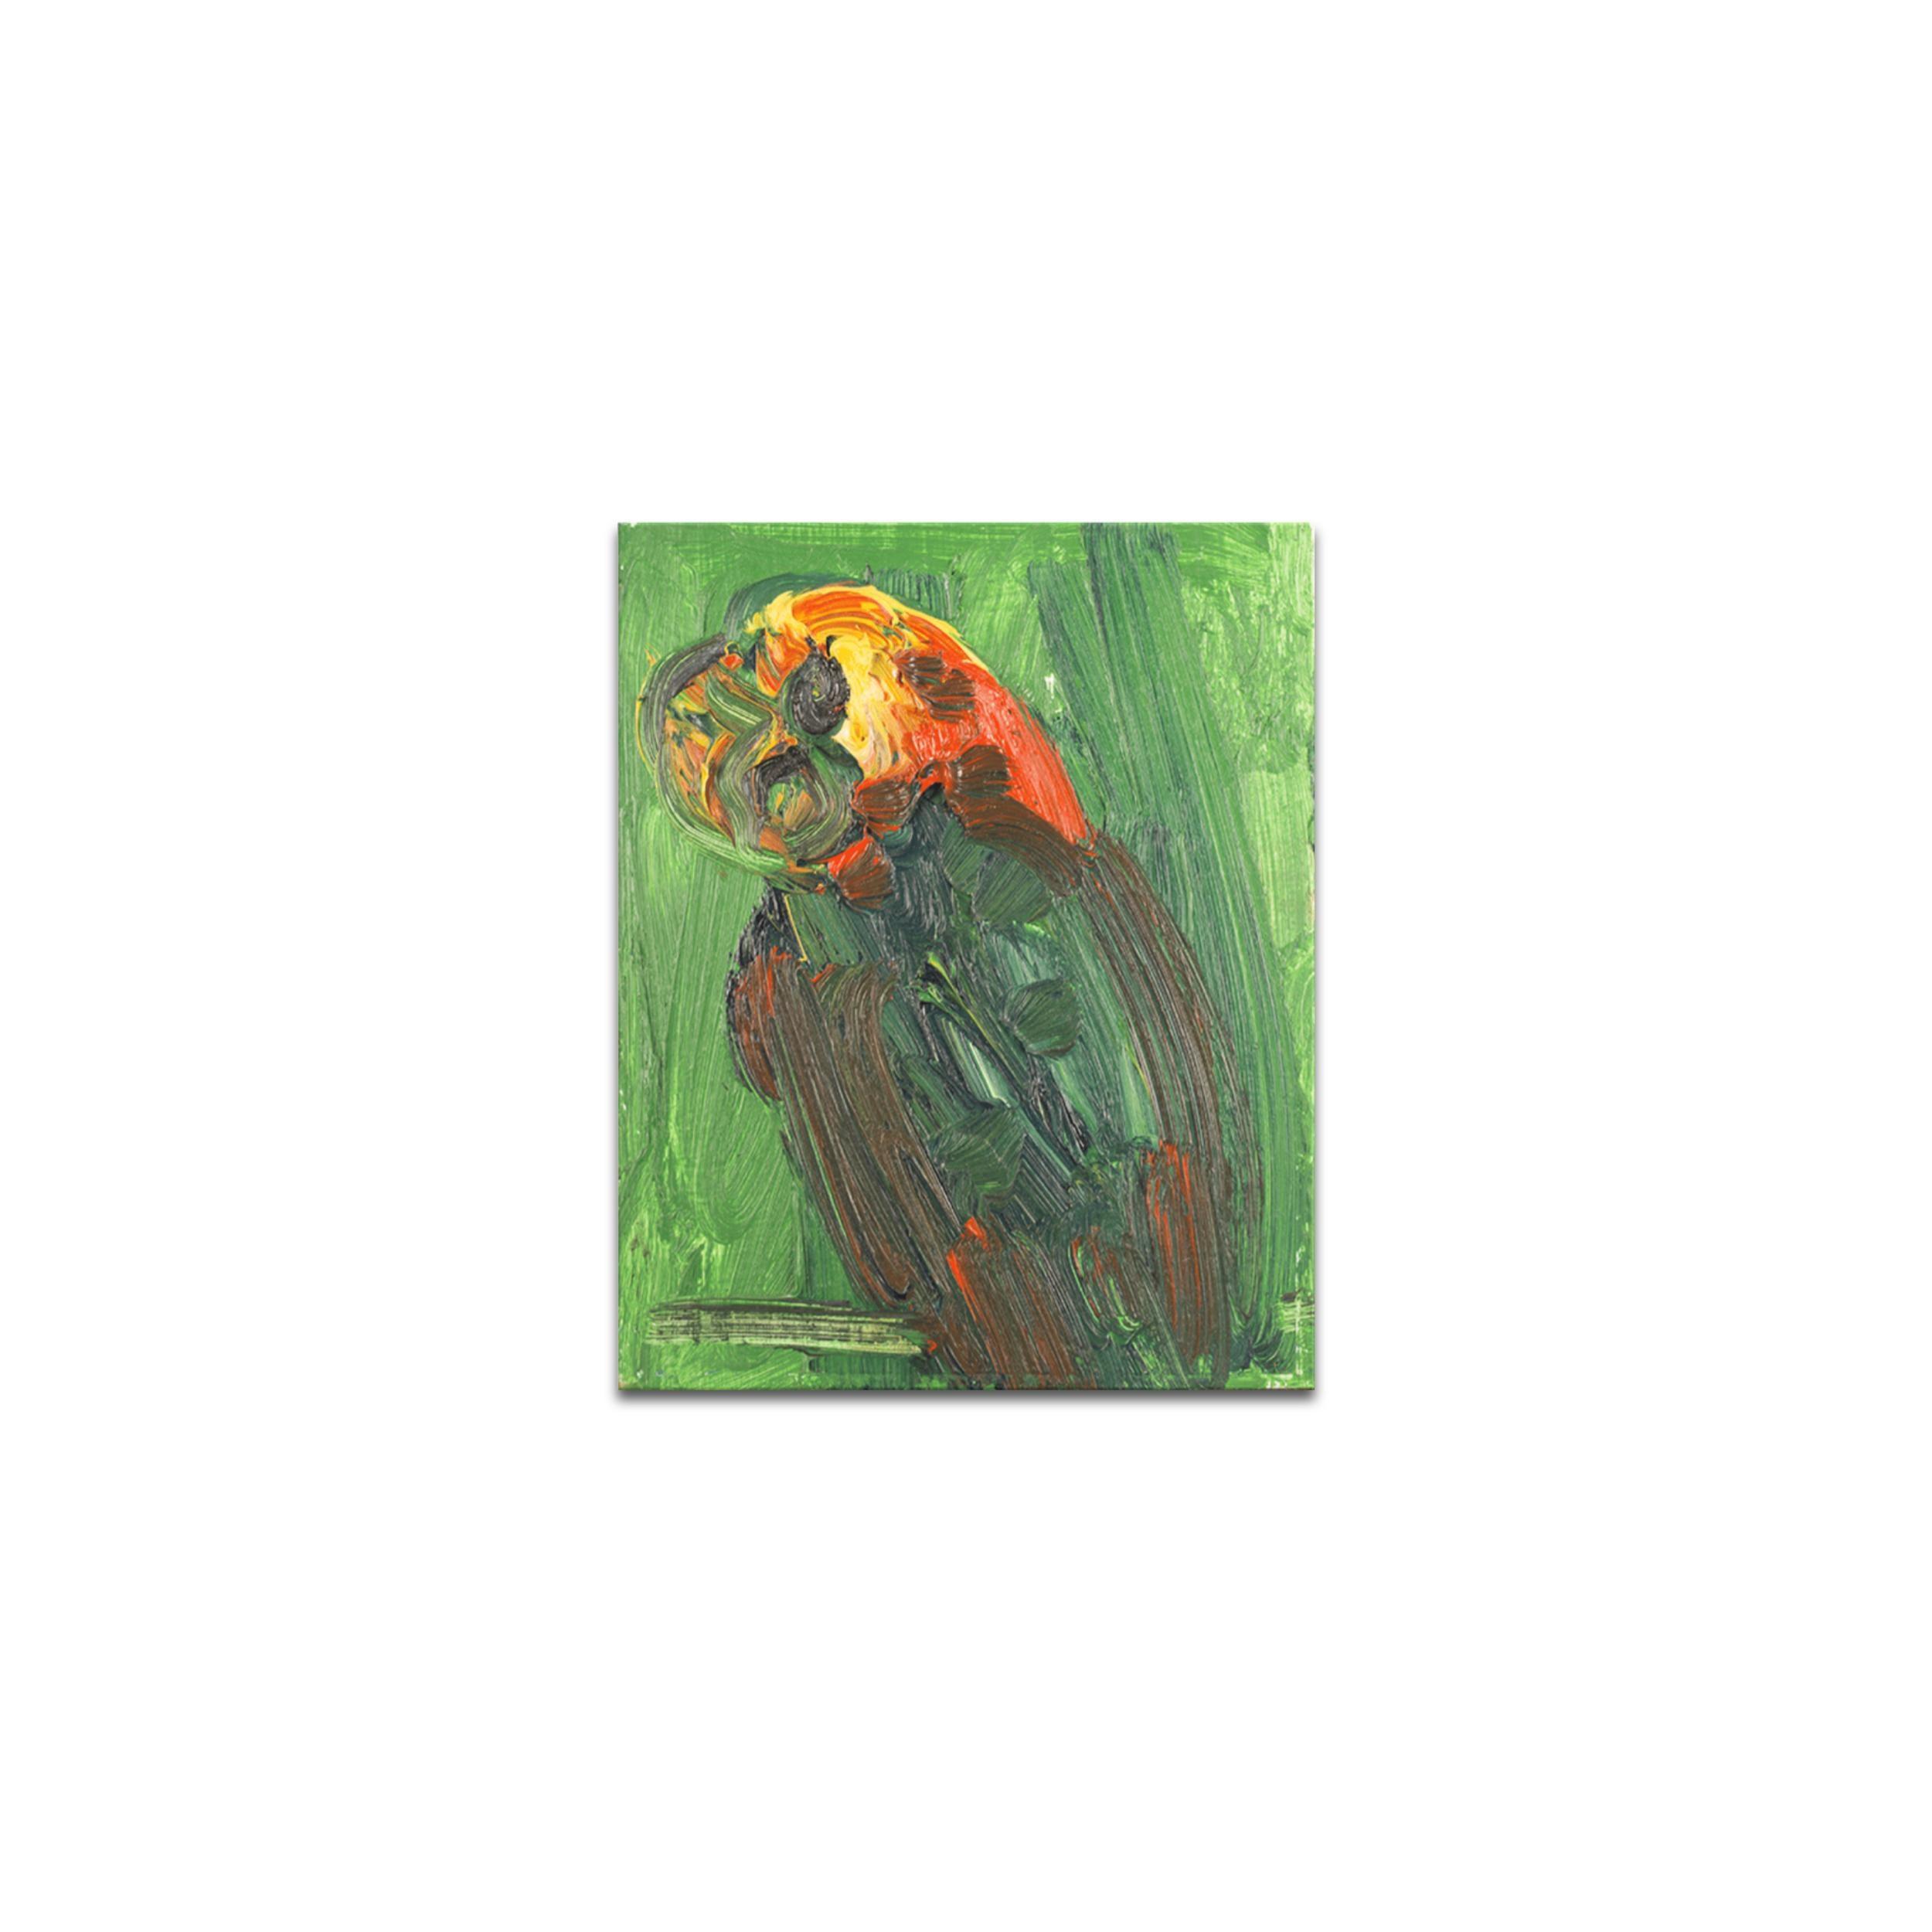 UNTITLED Green Bird